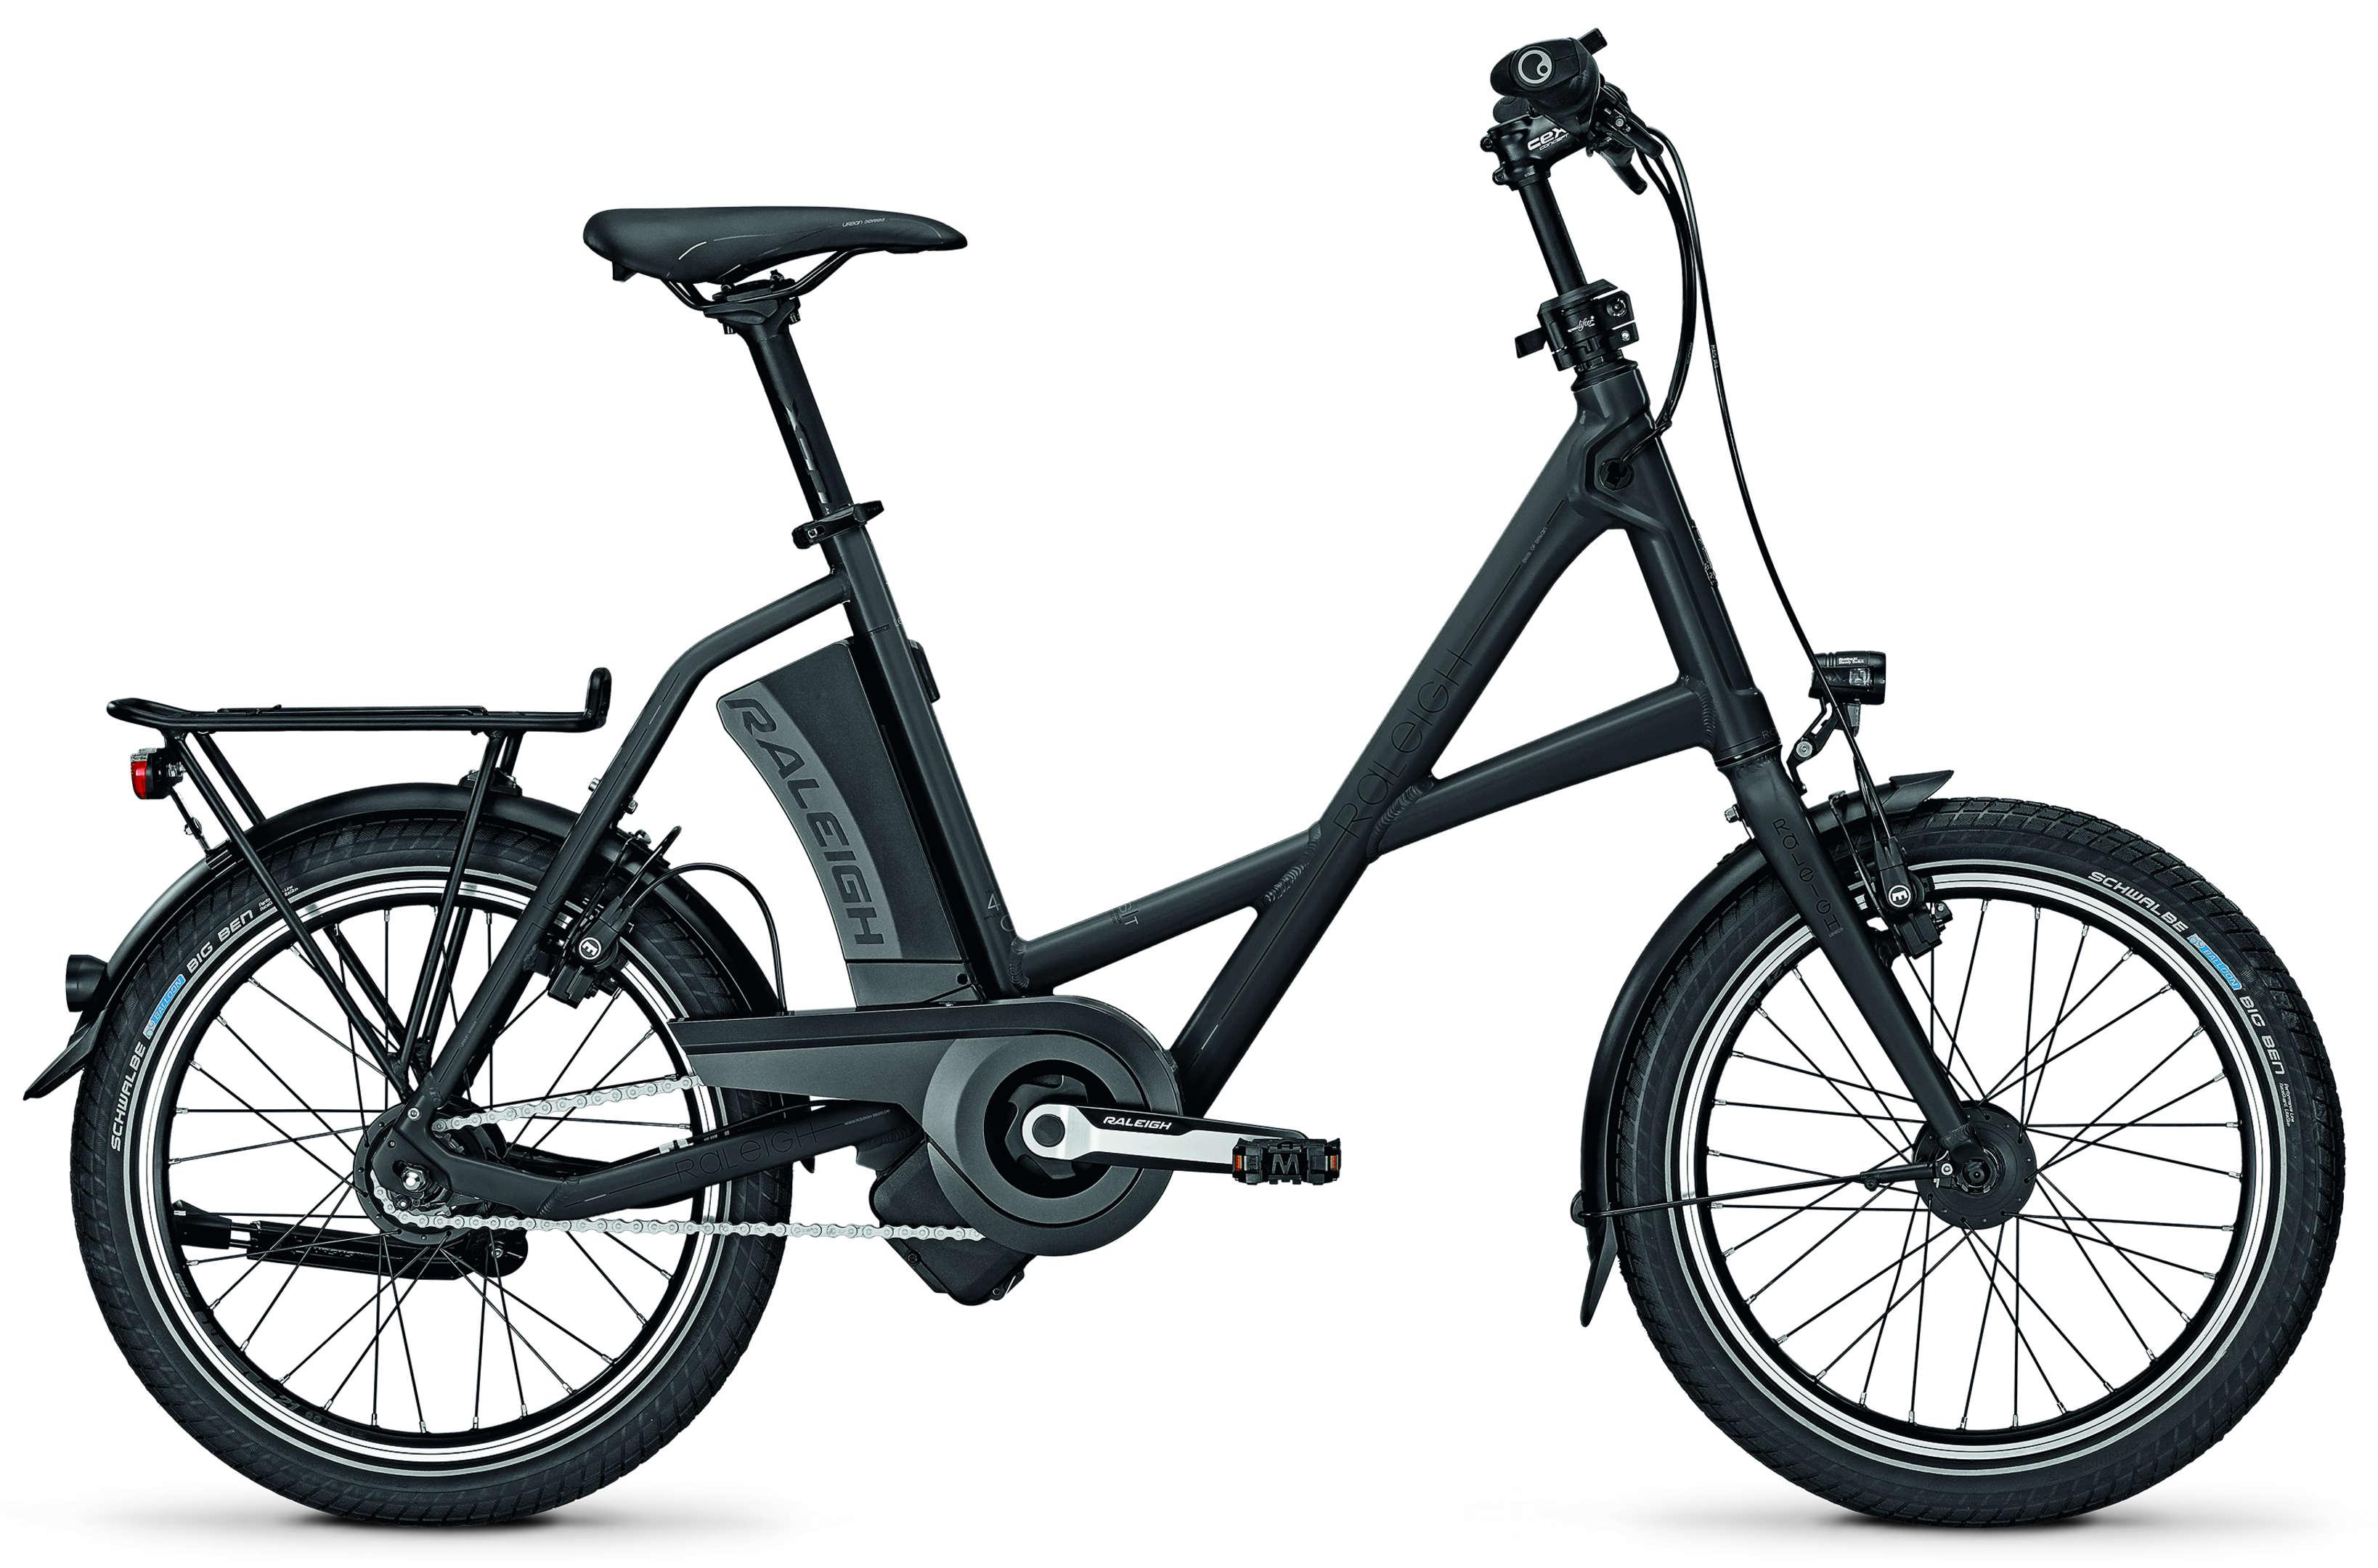 raleigh e bike leeds compact eurorad bikeleasingeurorad. Black Bedroom Furniture Sets. Home Design Ideas